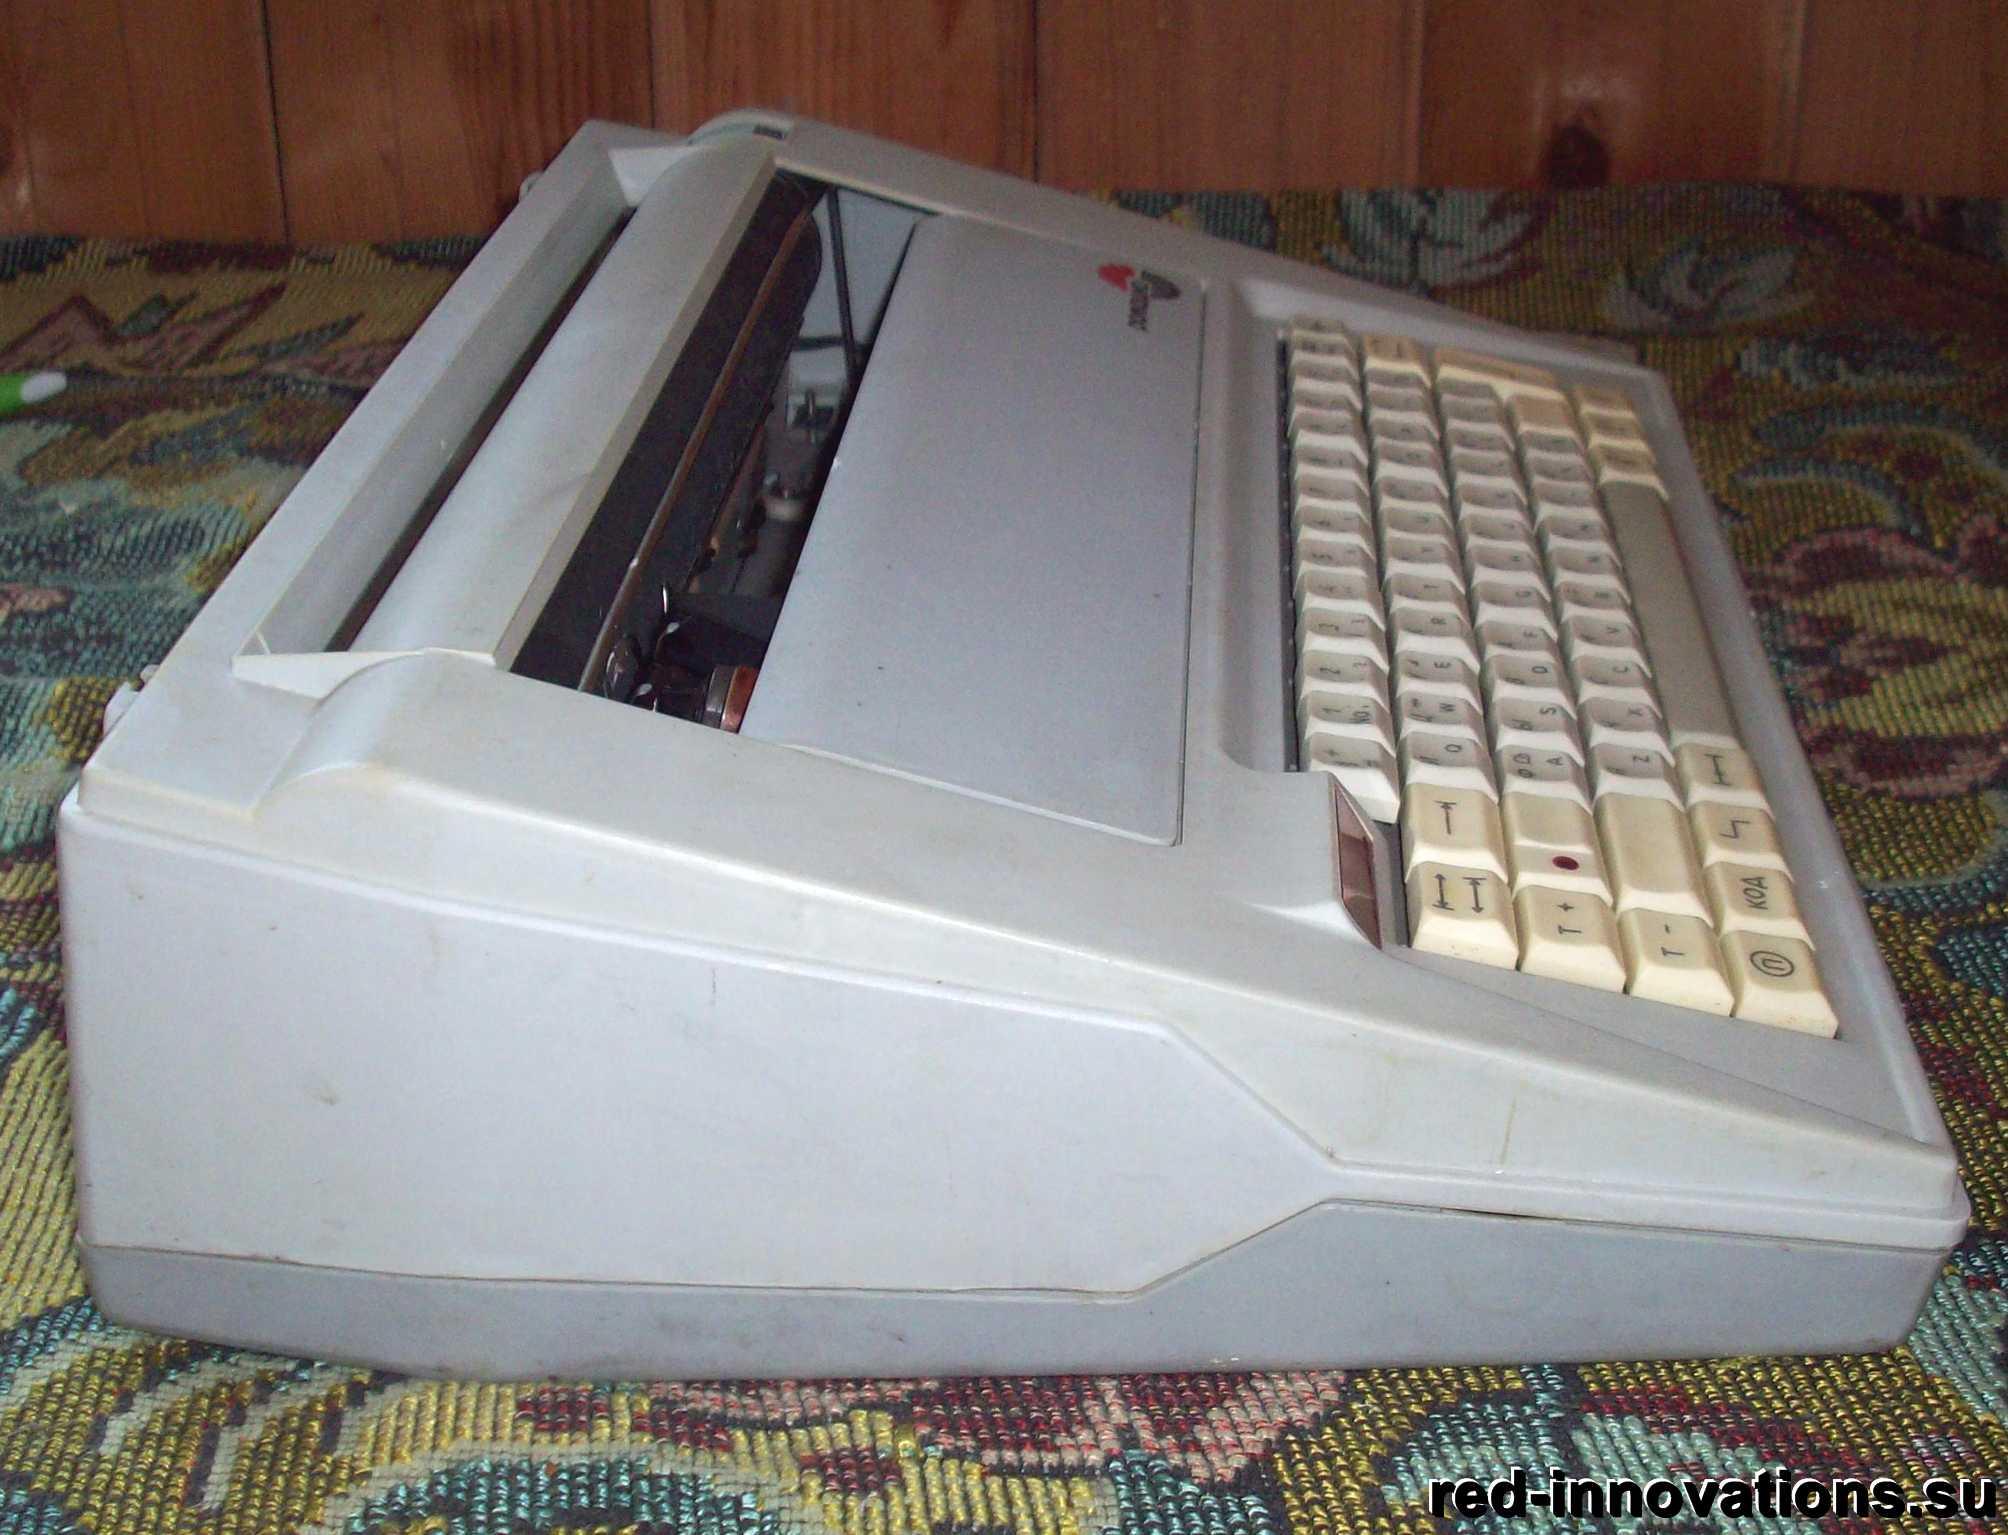 http://red-innovations.su/index/photos_c/romash/100_9598.jpg